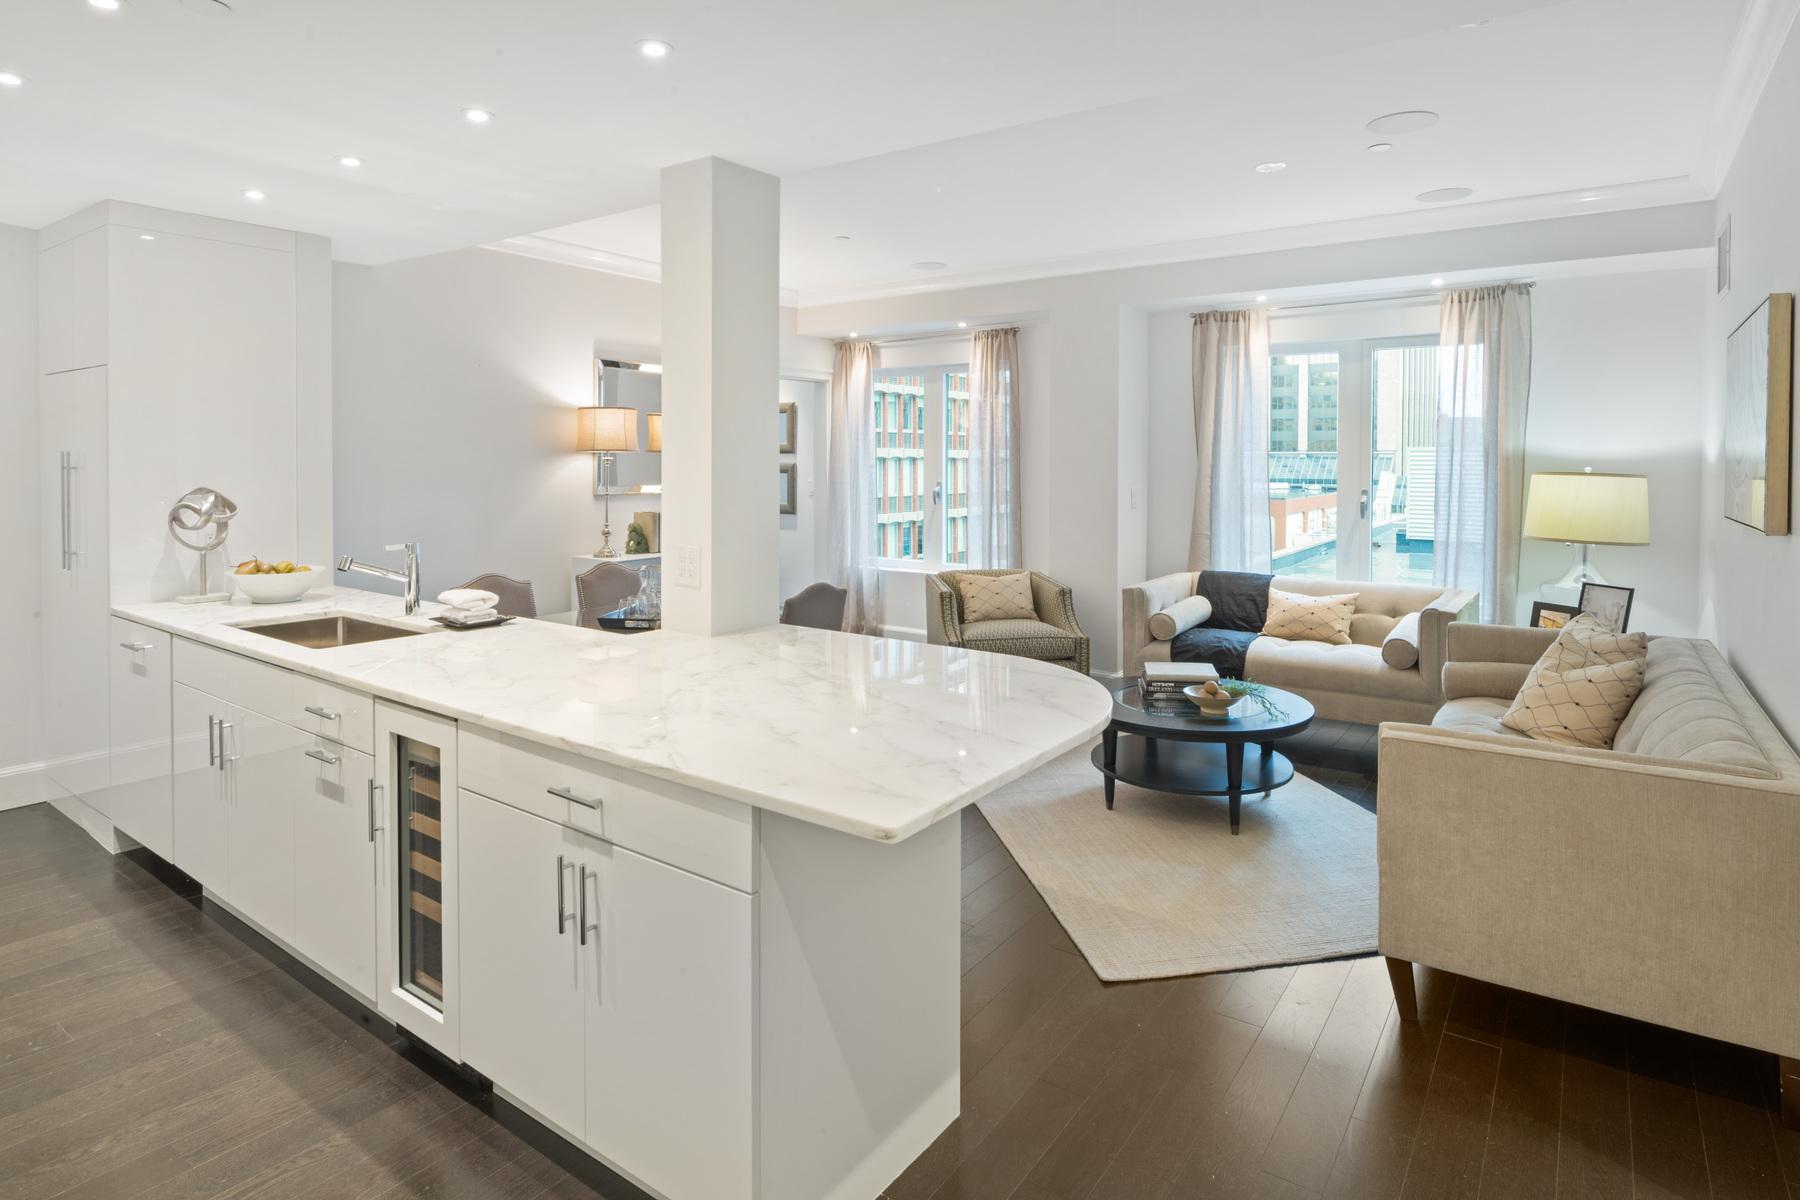 Condominium for Sale at Ultimate Living Experience At The Mandarin 778 Boylston Street Unit 7E, Boston, Massachusetts 02116 United States